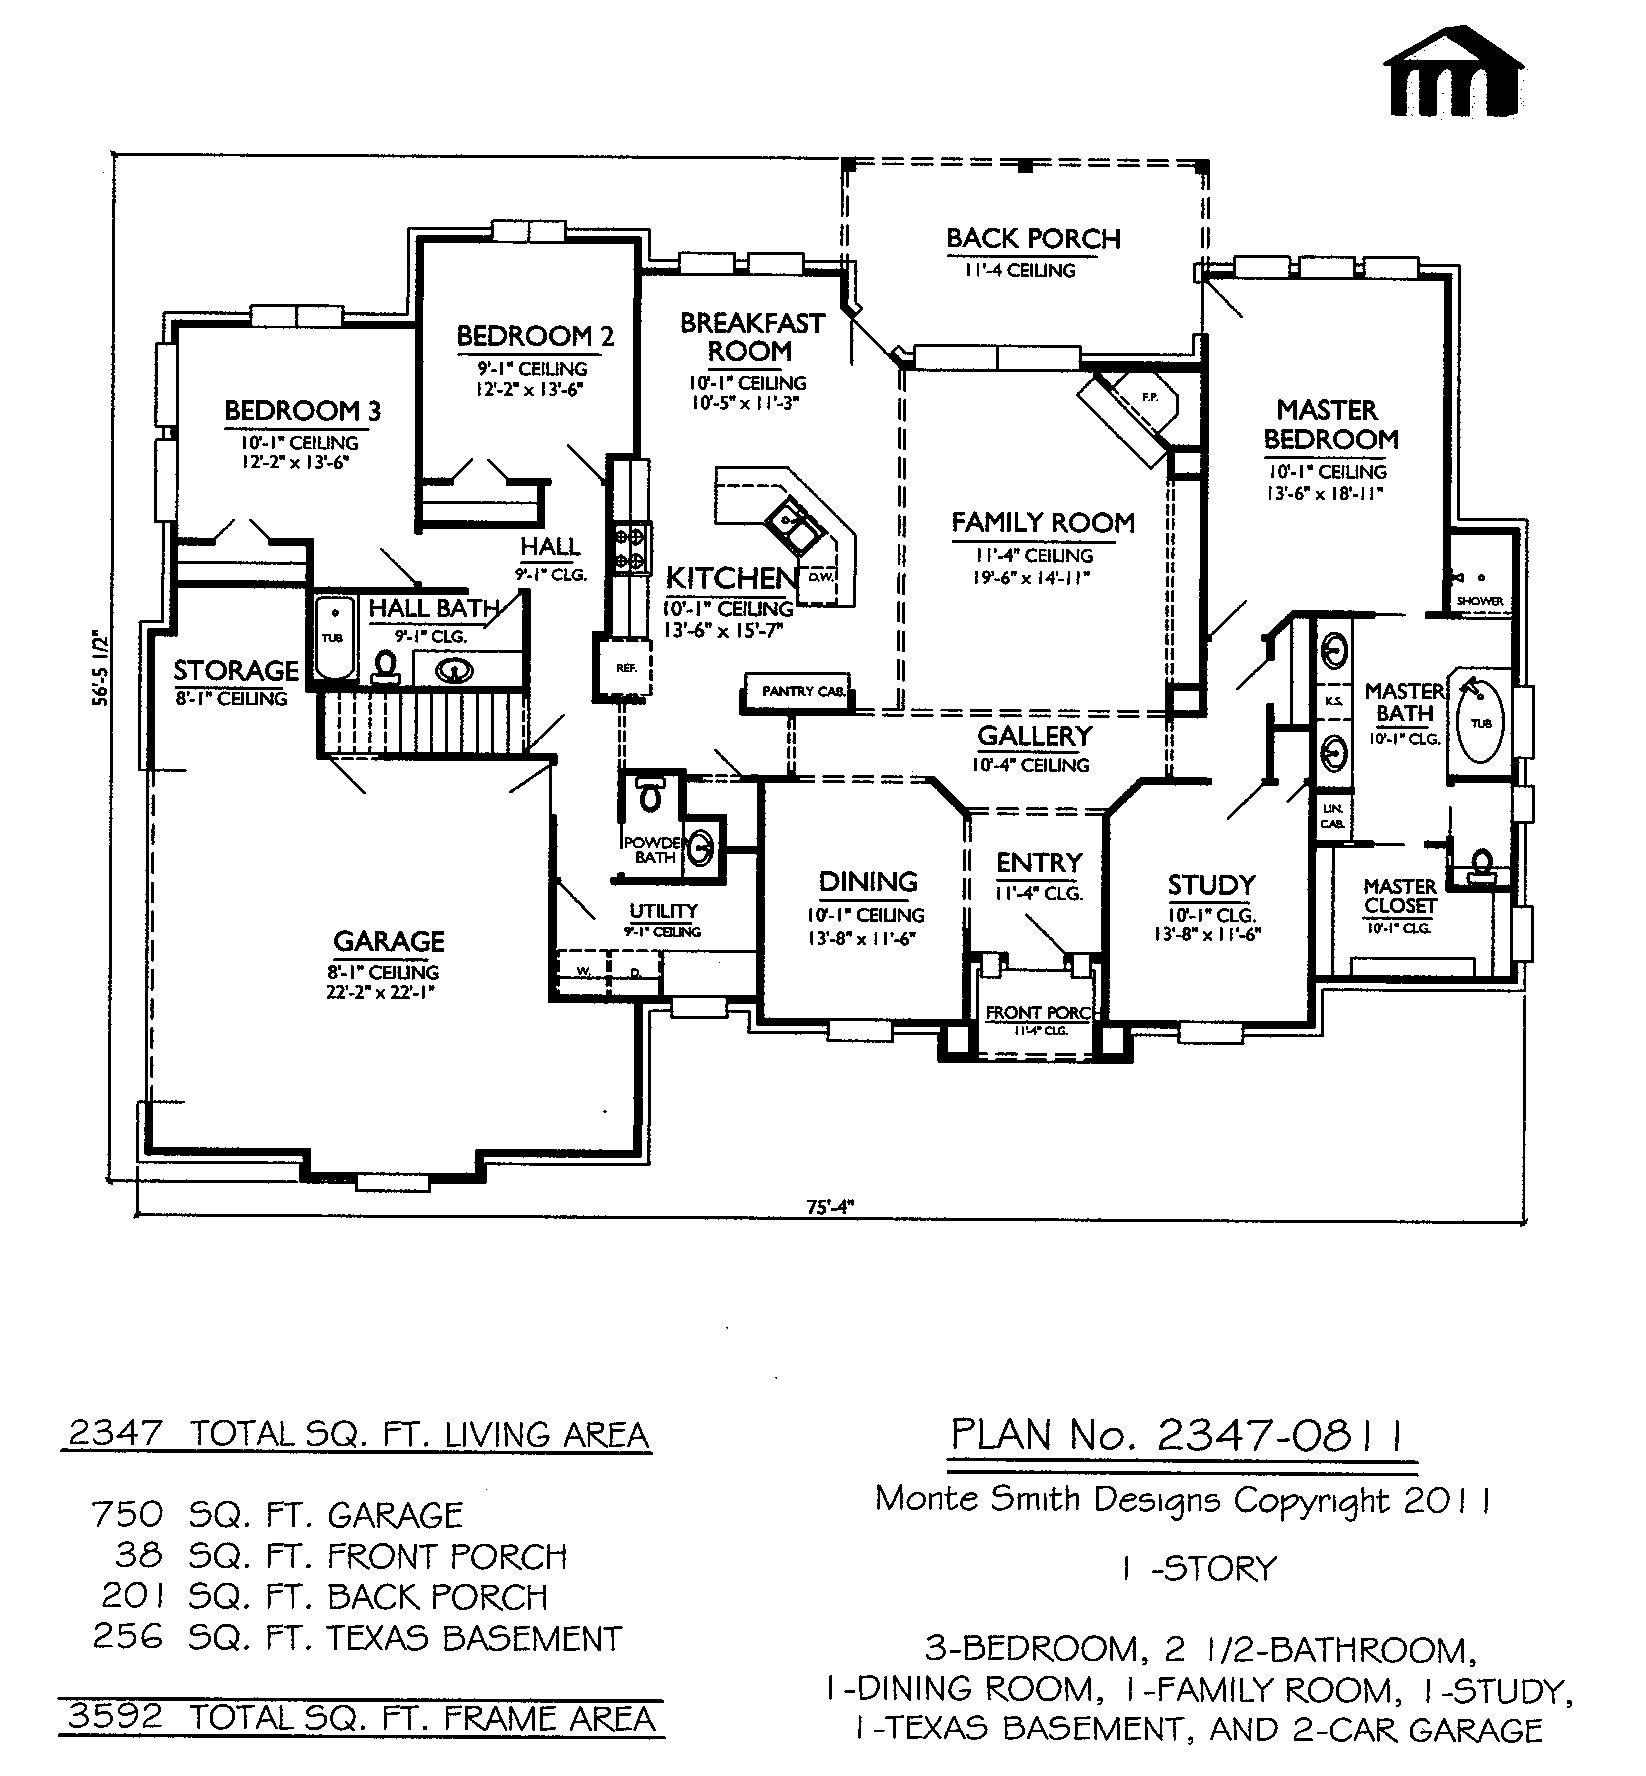 1 Story, 3 Bedroom, 2 1/2 Bathroom, 1 Dining Room, 1